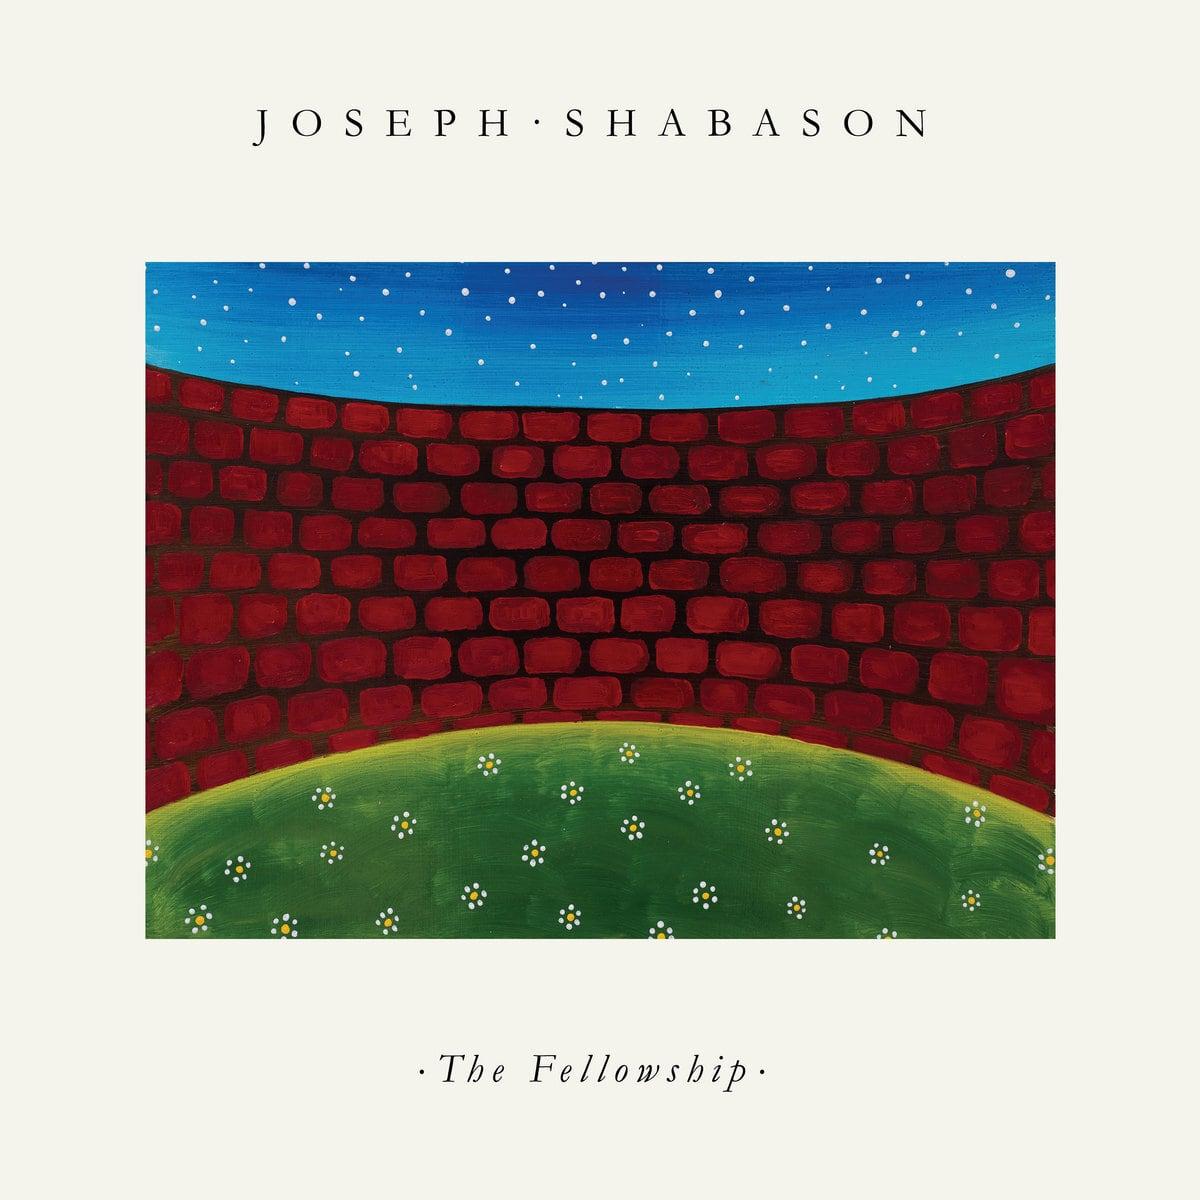 Joseph Shabason - The Fellowship (LTD. Sky Blue LP)